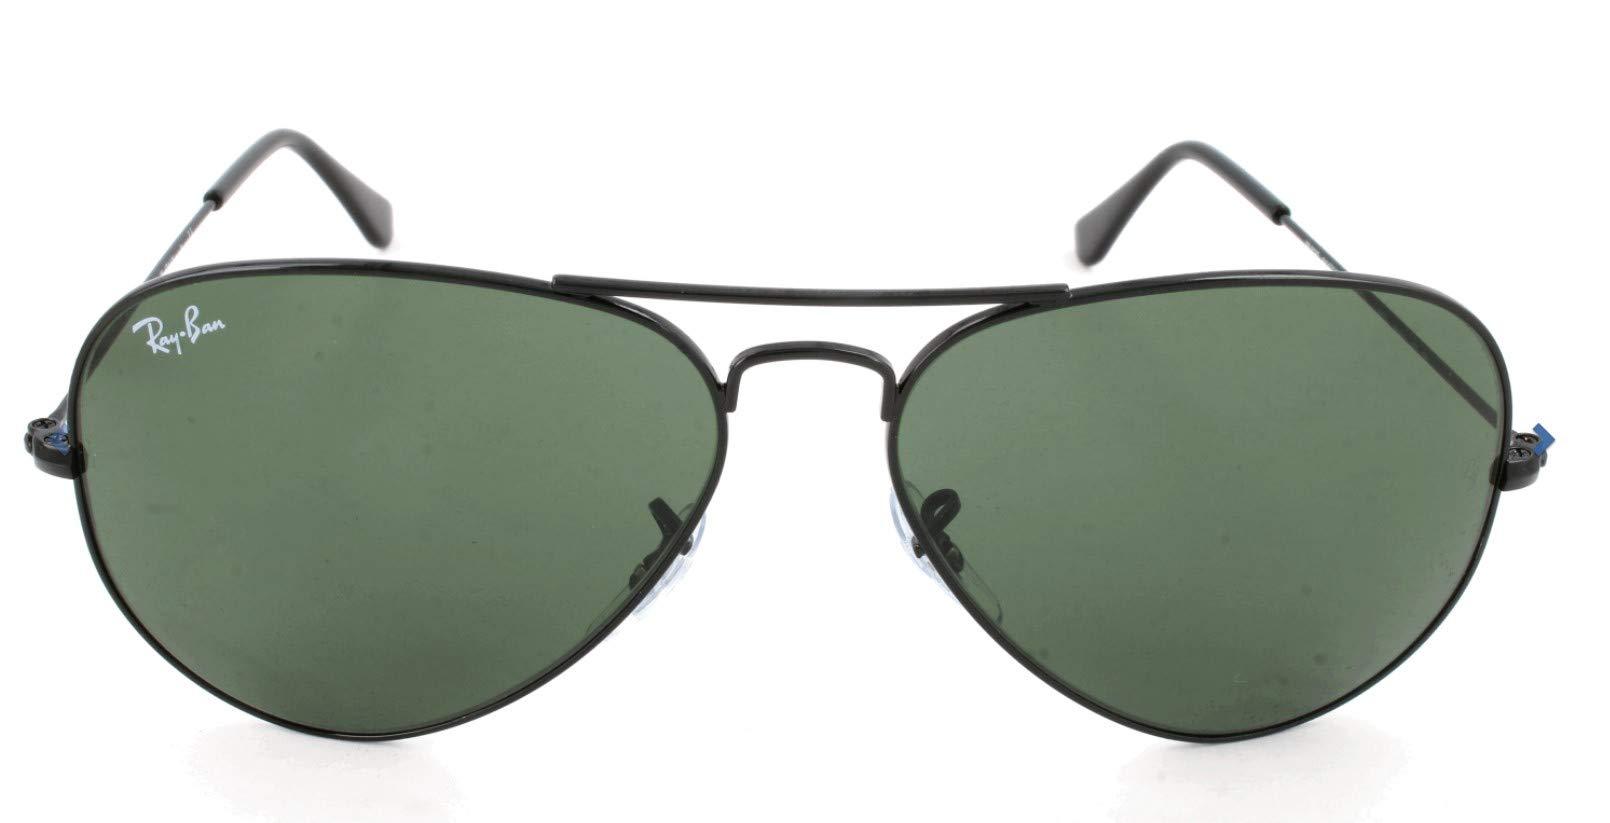 Ray-Ban RB3025 Aviator Sunglasses, Black/Green, 58 mm by Ray-Ban